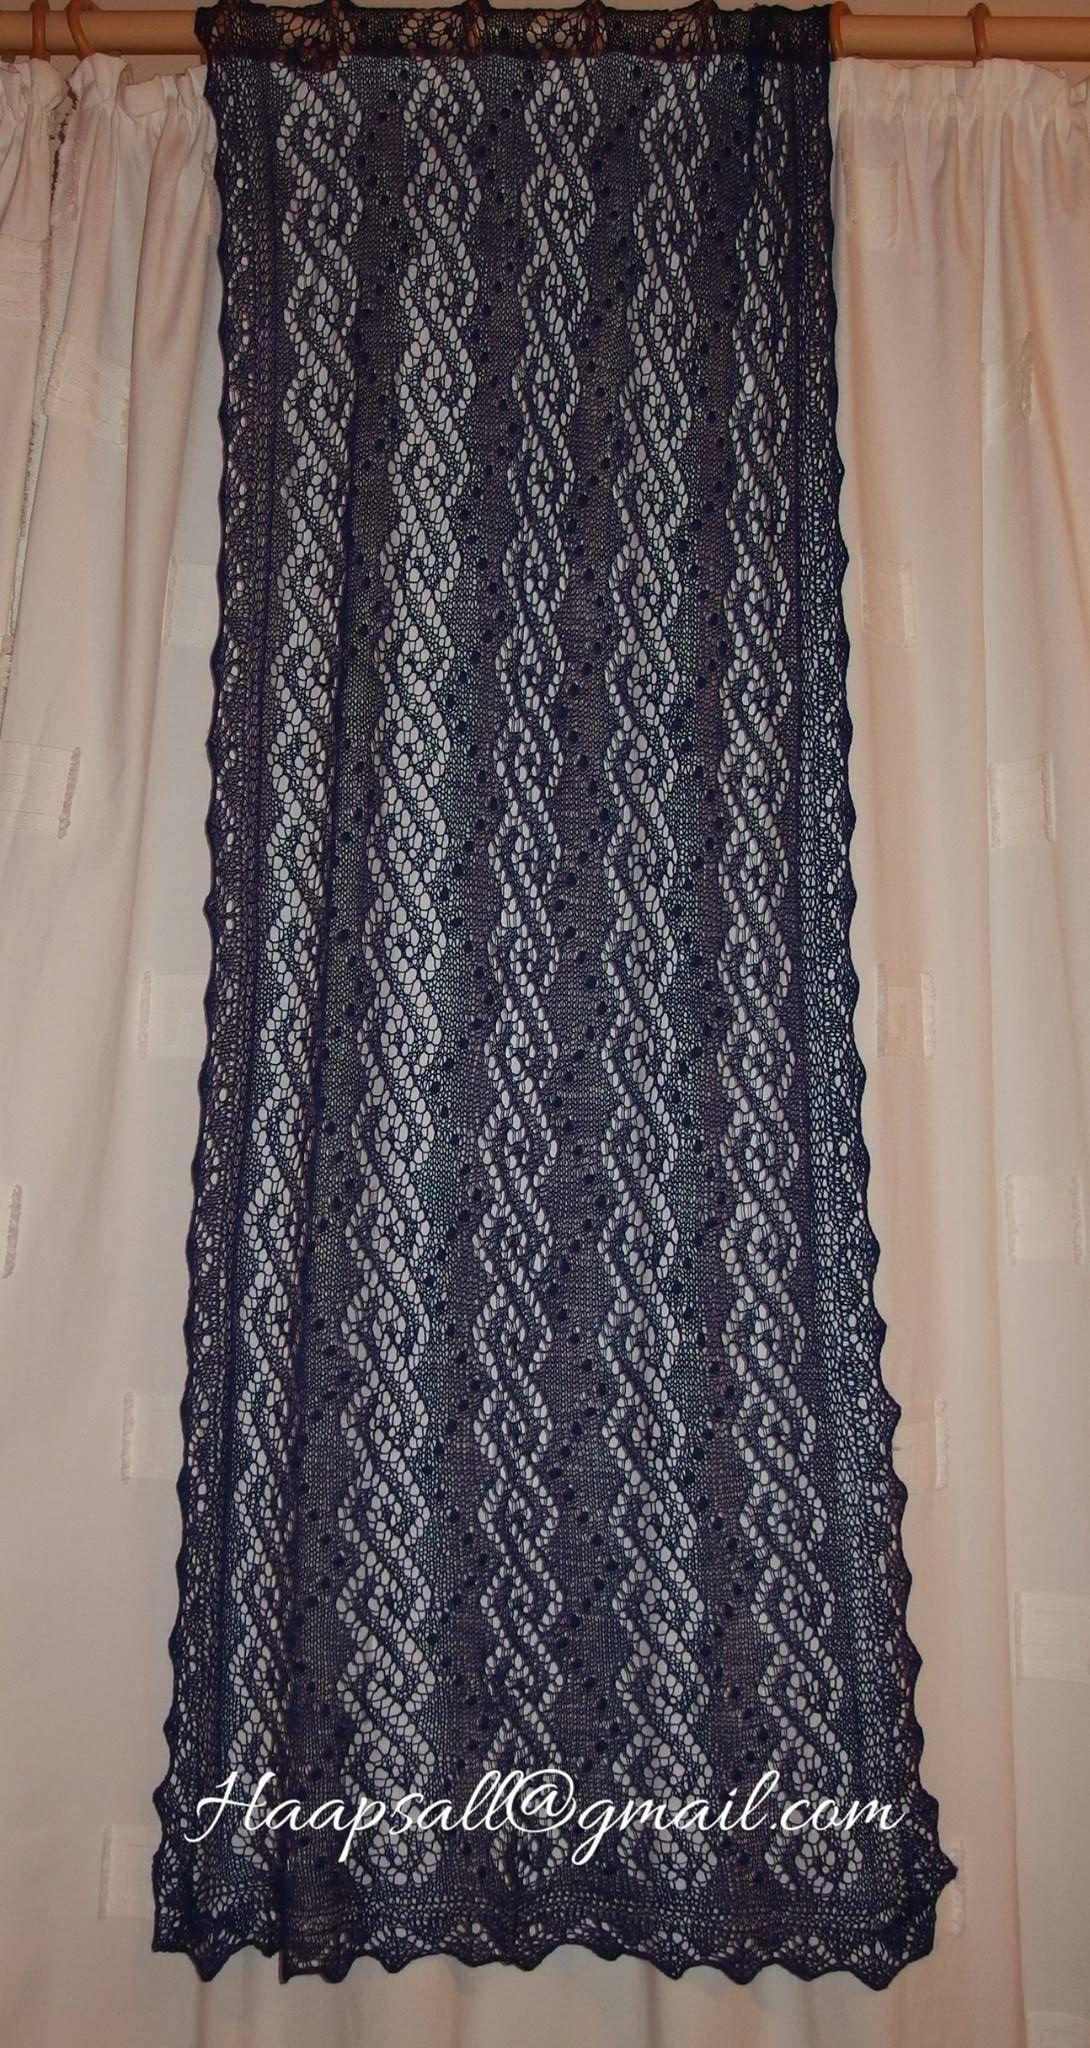 Haapsalu shawl, Rhomb-spiral pattern | Haapsalu shawls ...